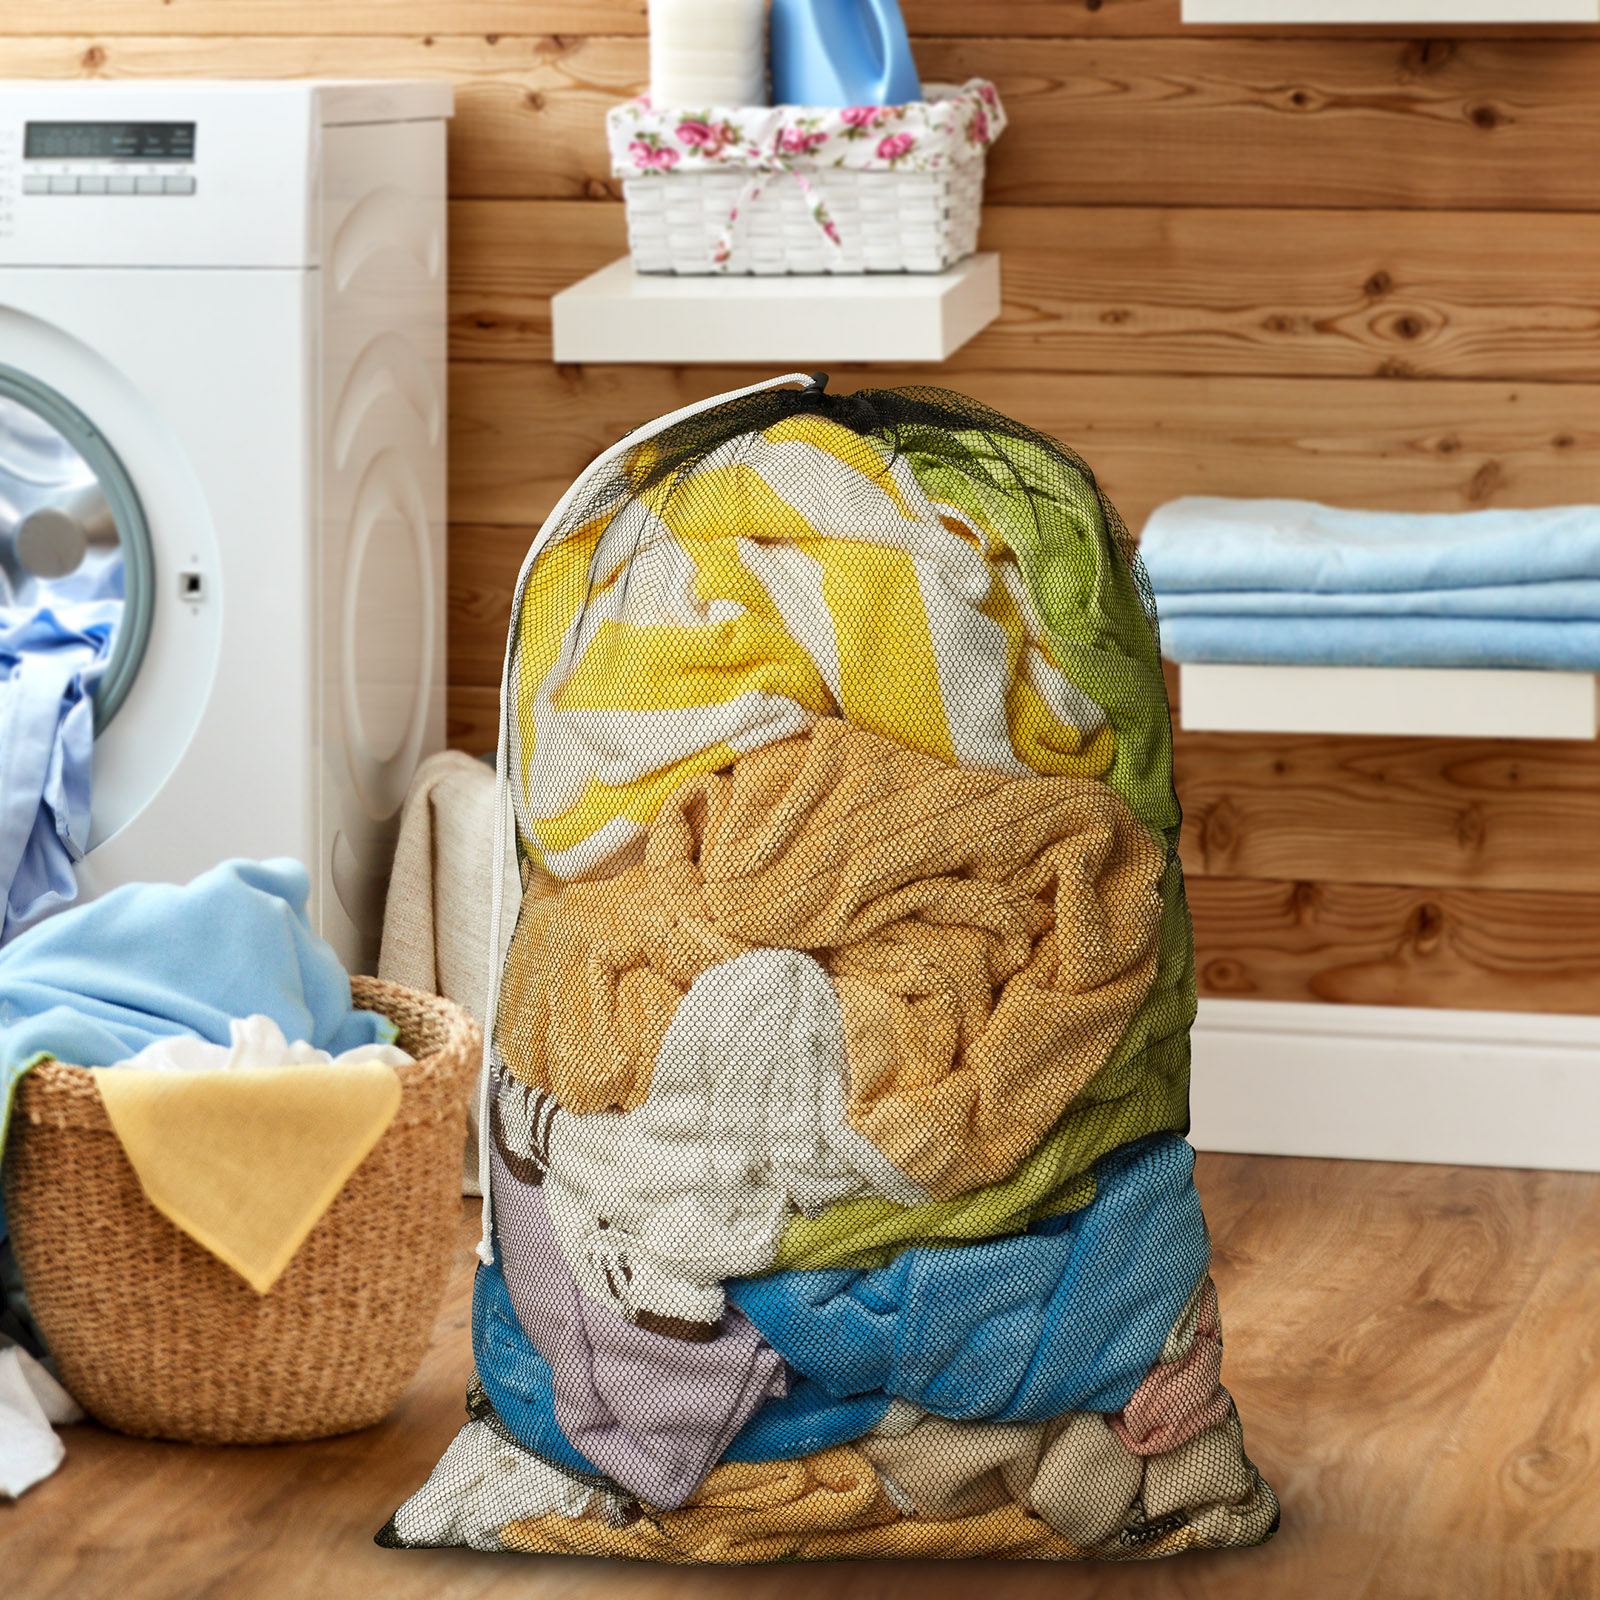 24-034-x-36-034-Large-Heavy-Duty-Mesh-Net-Drawstring-Laundry-or-Equipment-Ball-Bag thumbnail 7